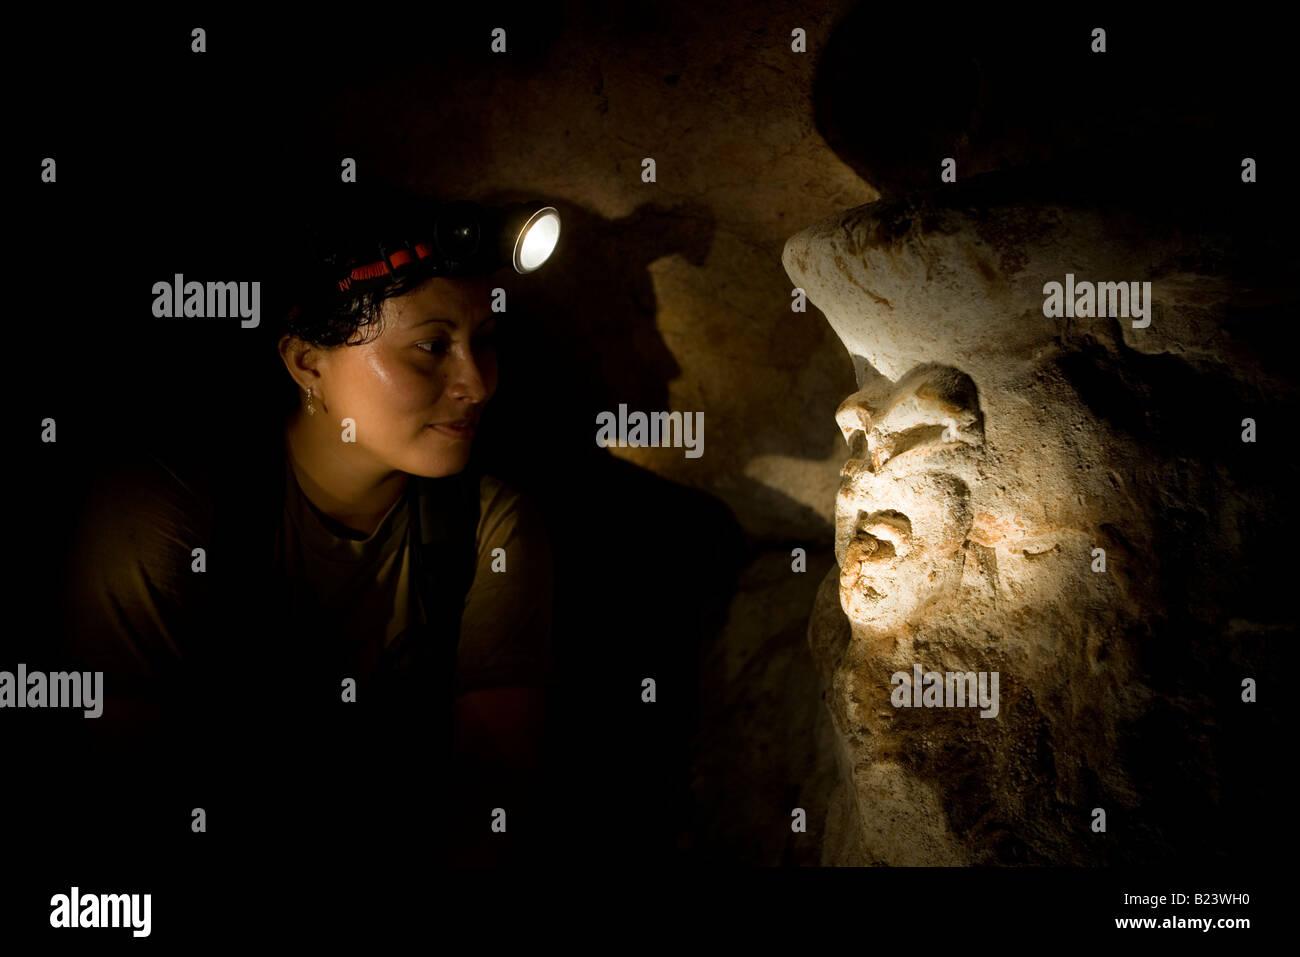 Mayan figure in underground cavern, Belize. - Stock Image